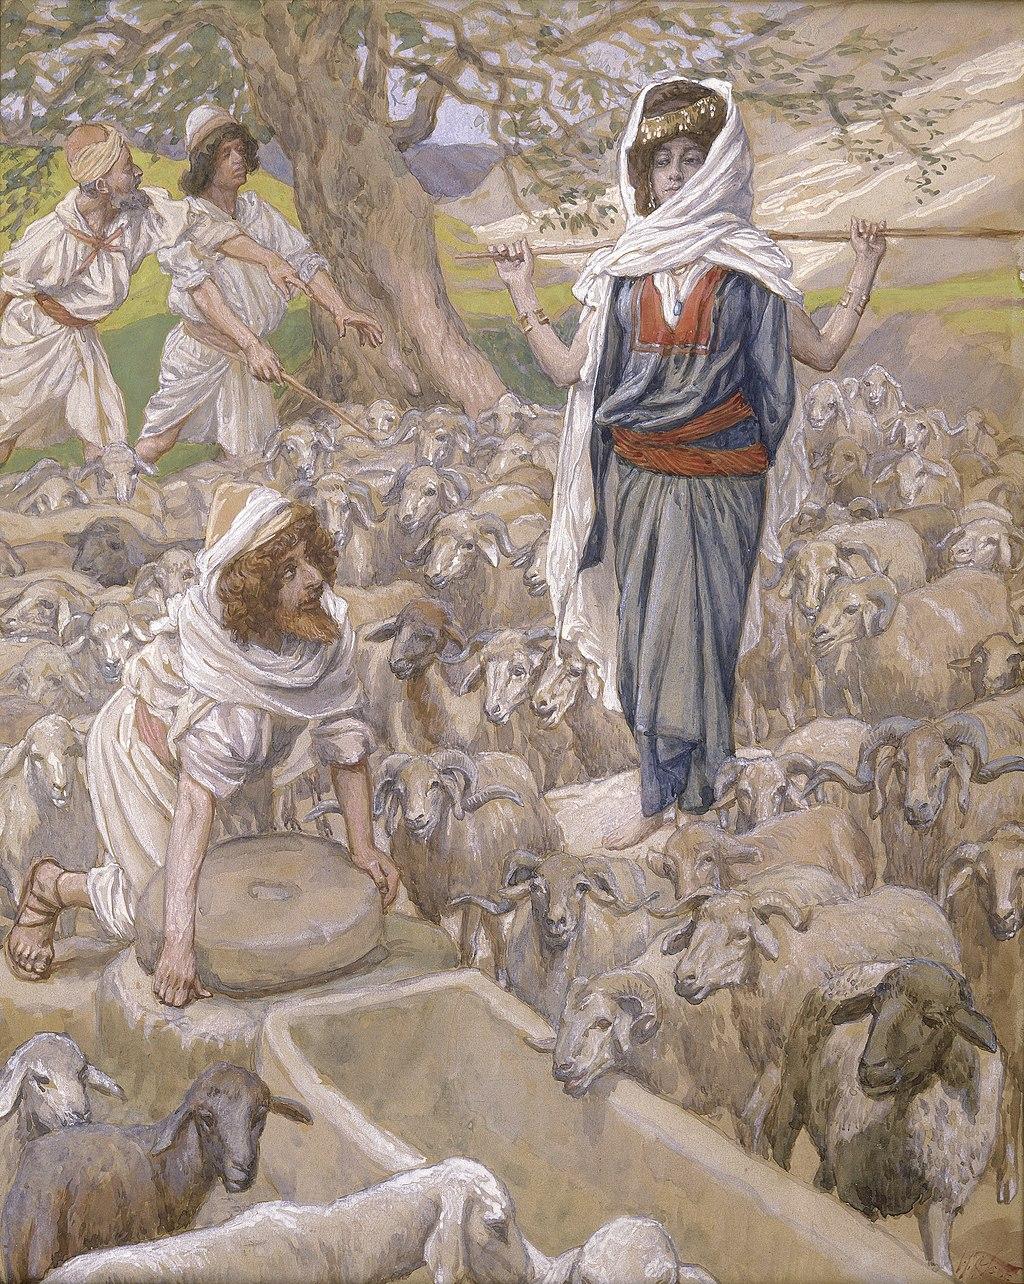 Rachel, wife of Jacob and mother to Joseph and Benjamin (Genesis 29-48).